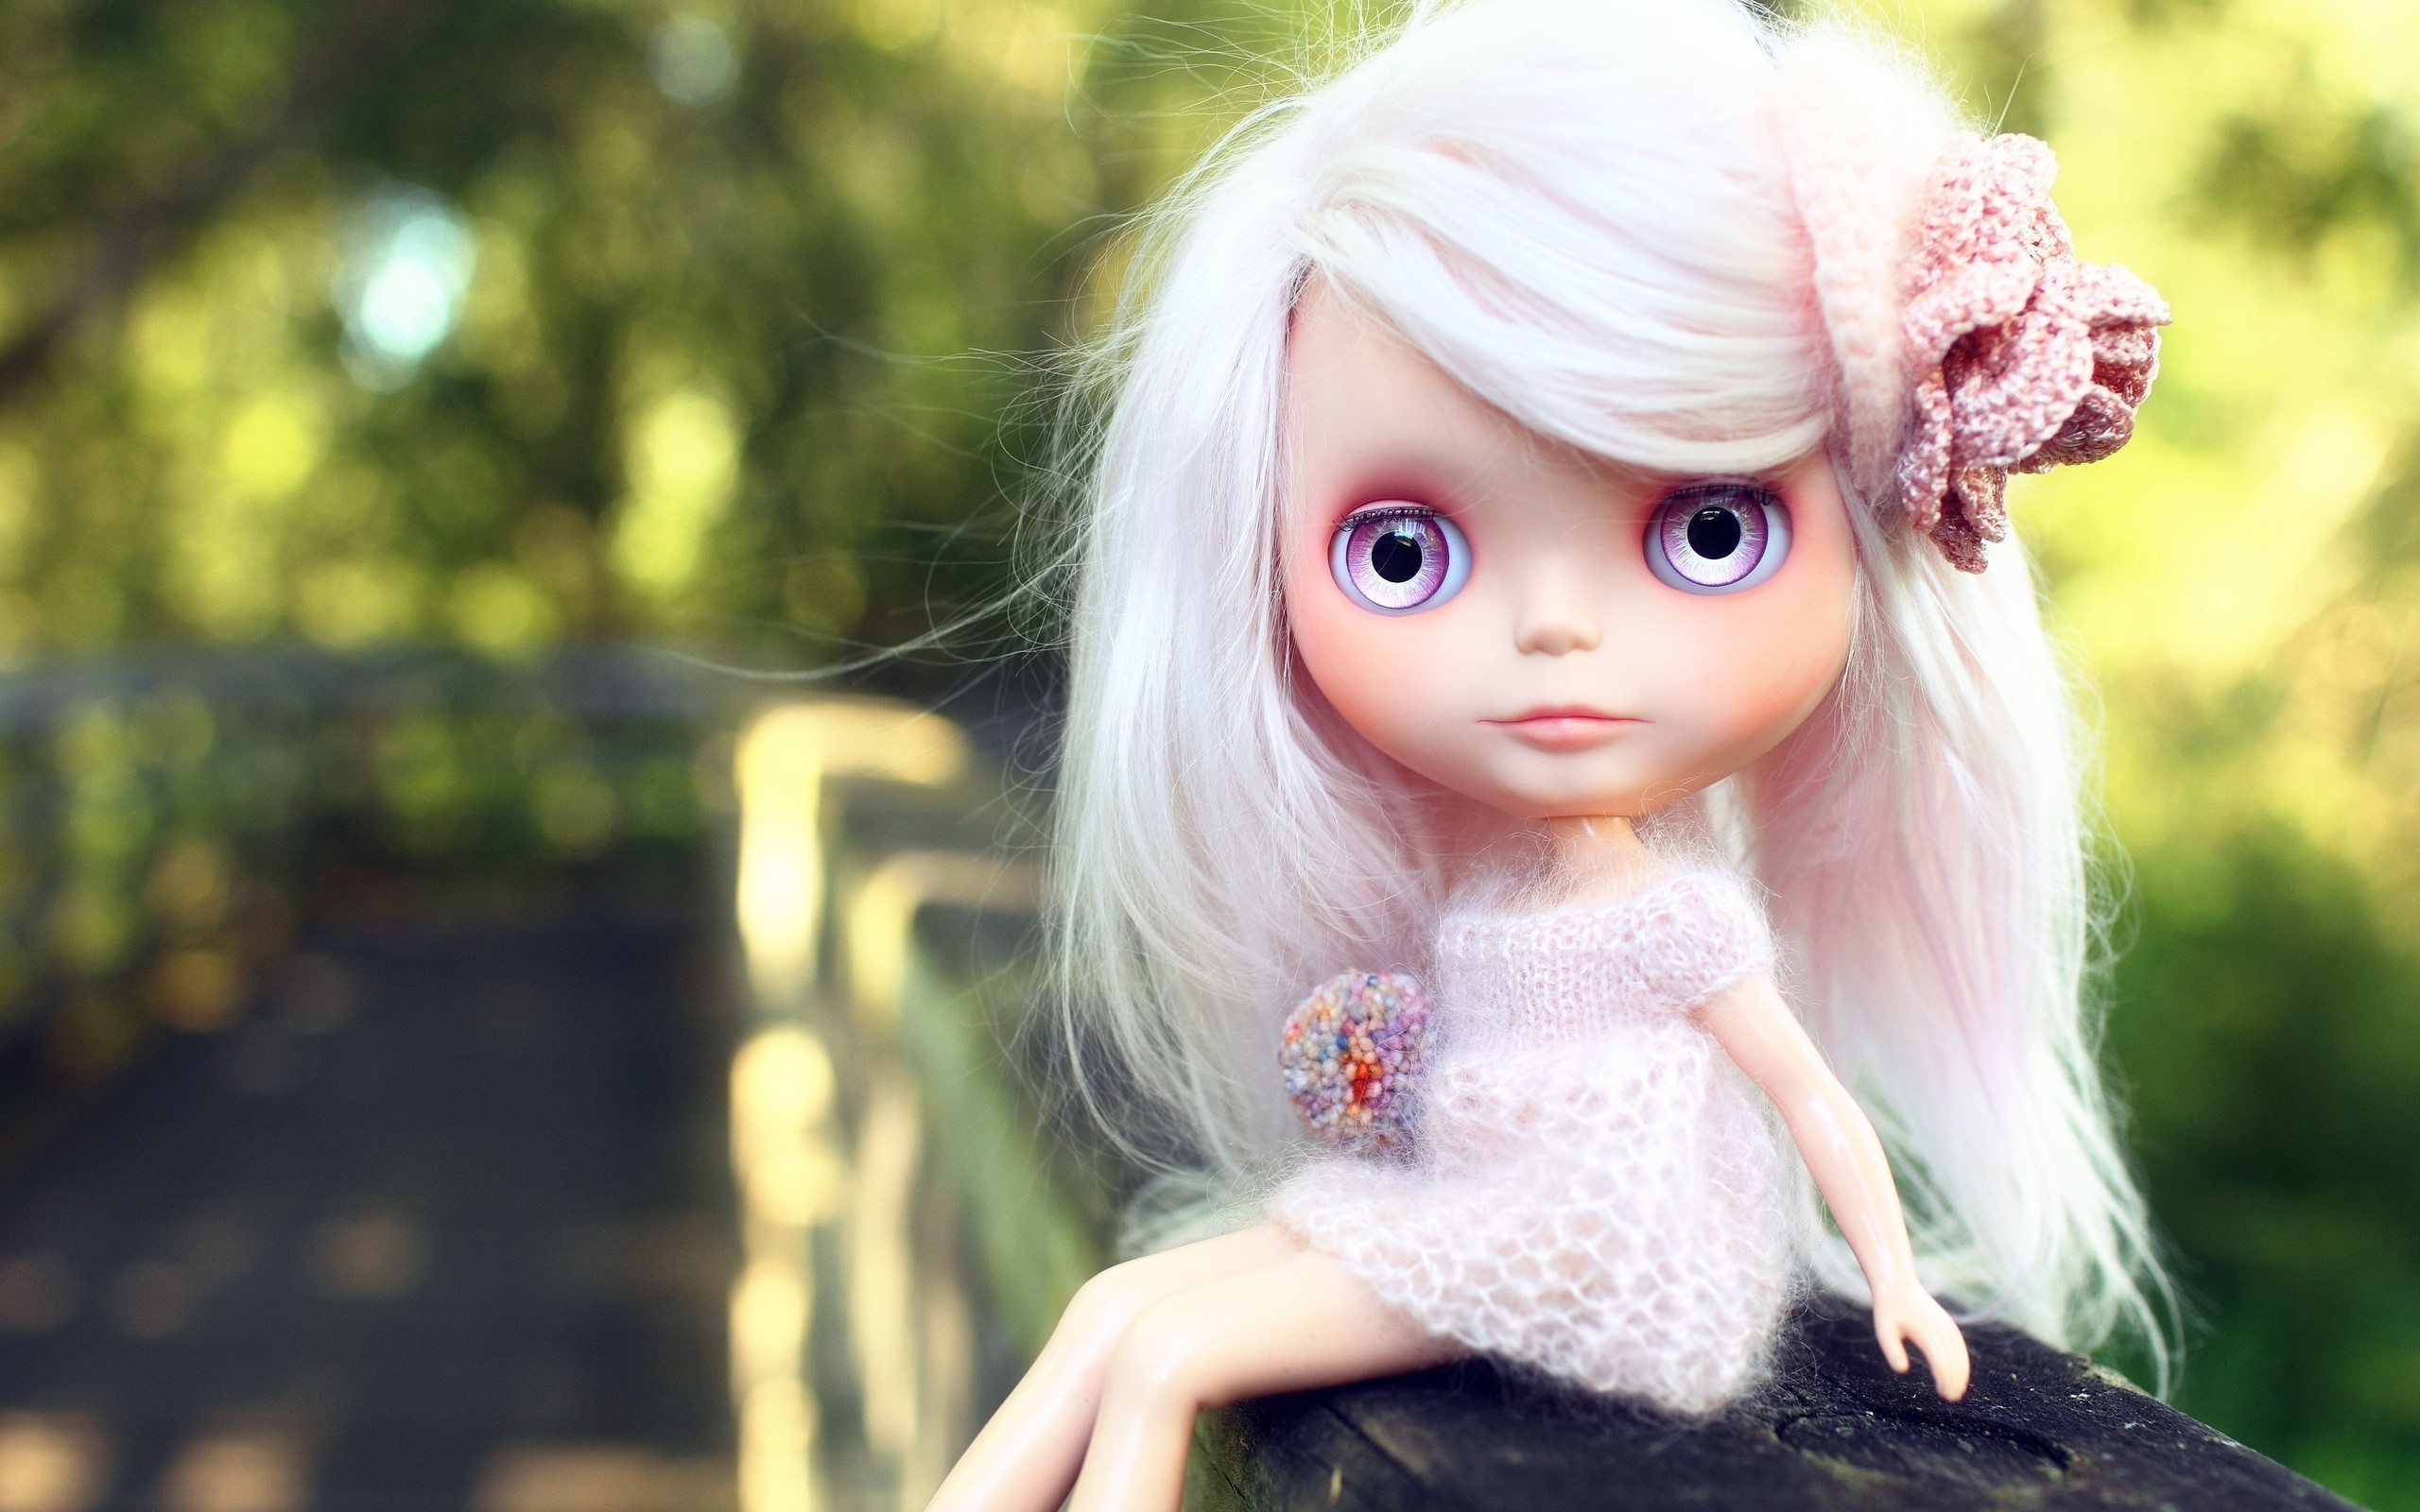 Cool Wallpaper Love Barbie - 843483-latest-wallpaper-of-barbie-on-2018-2560x1600-retina  2018_43727.jpg